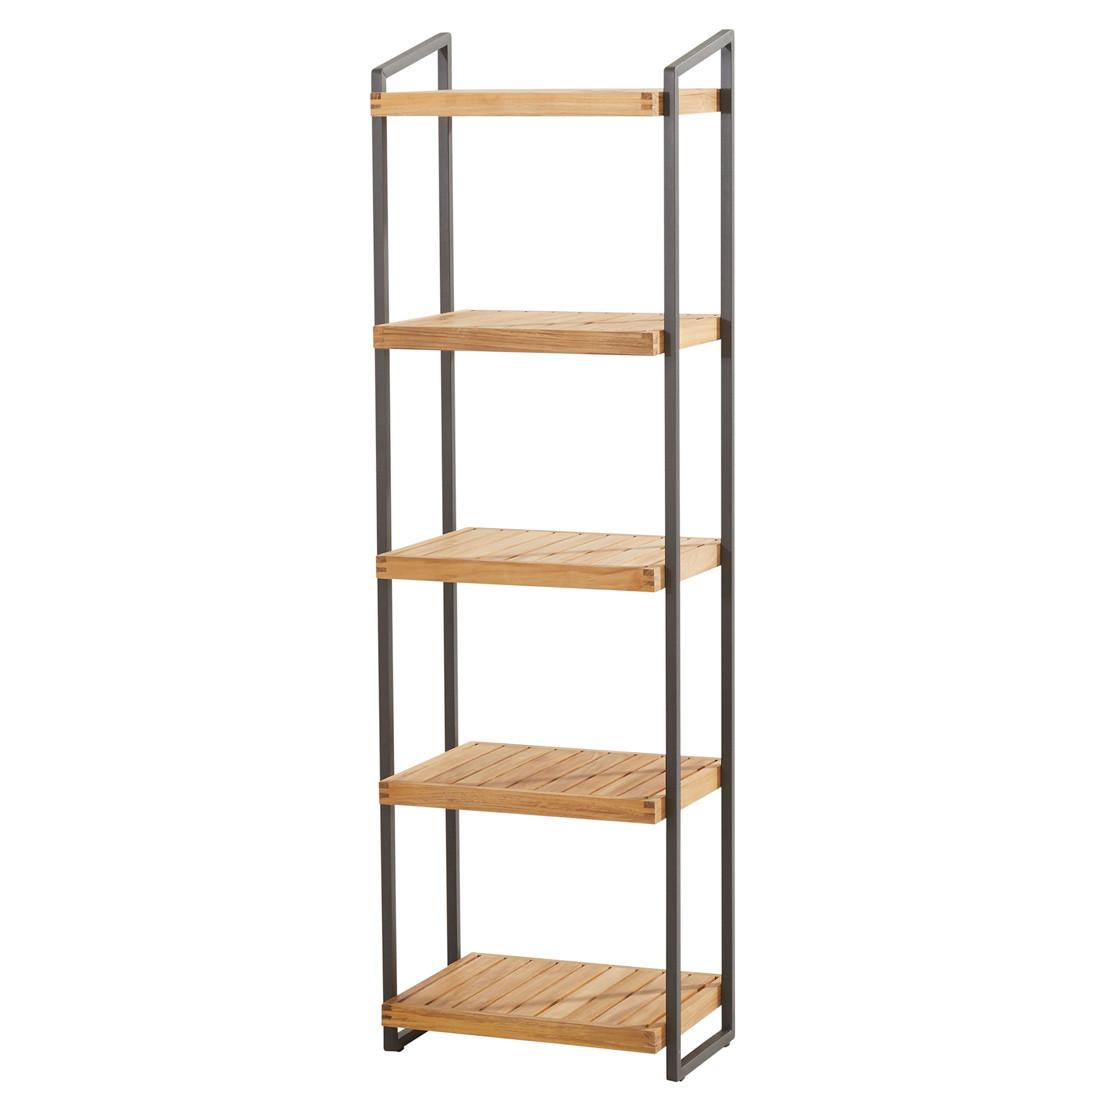 Rack with 5 shelves 50x40x175cm